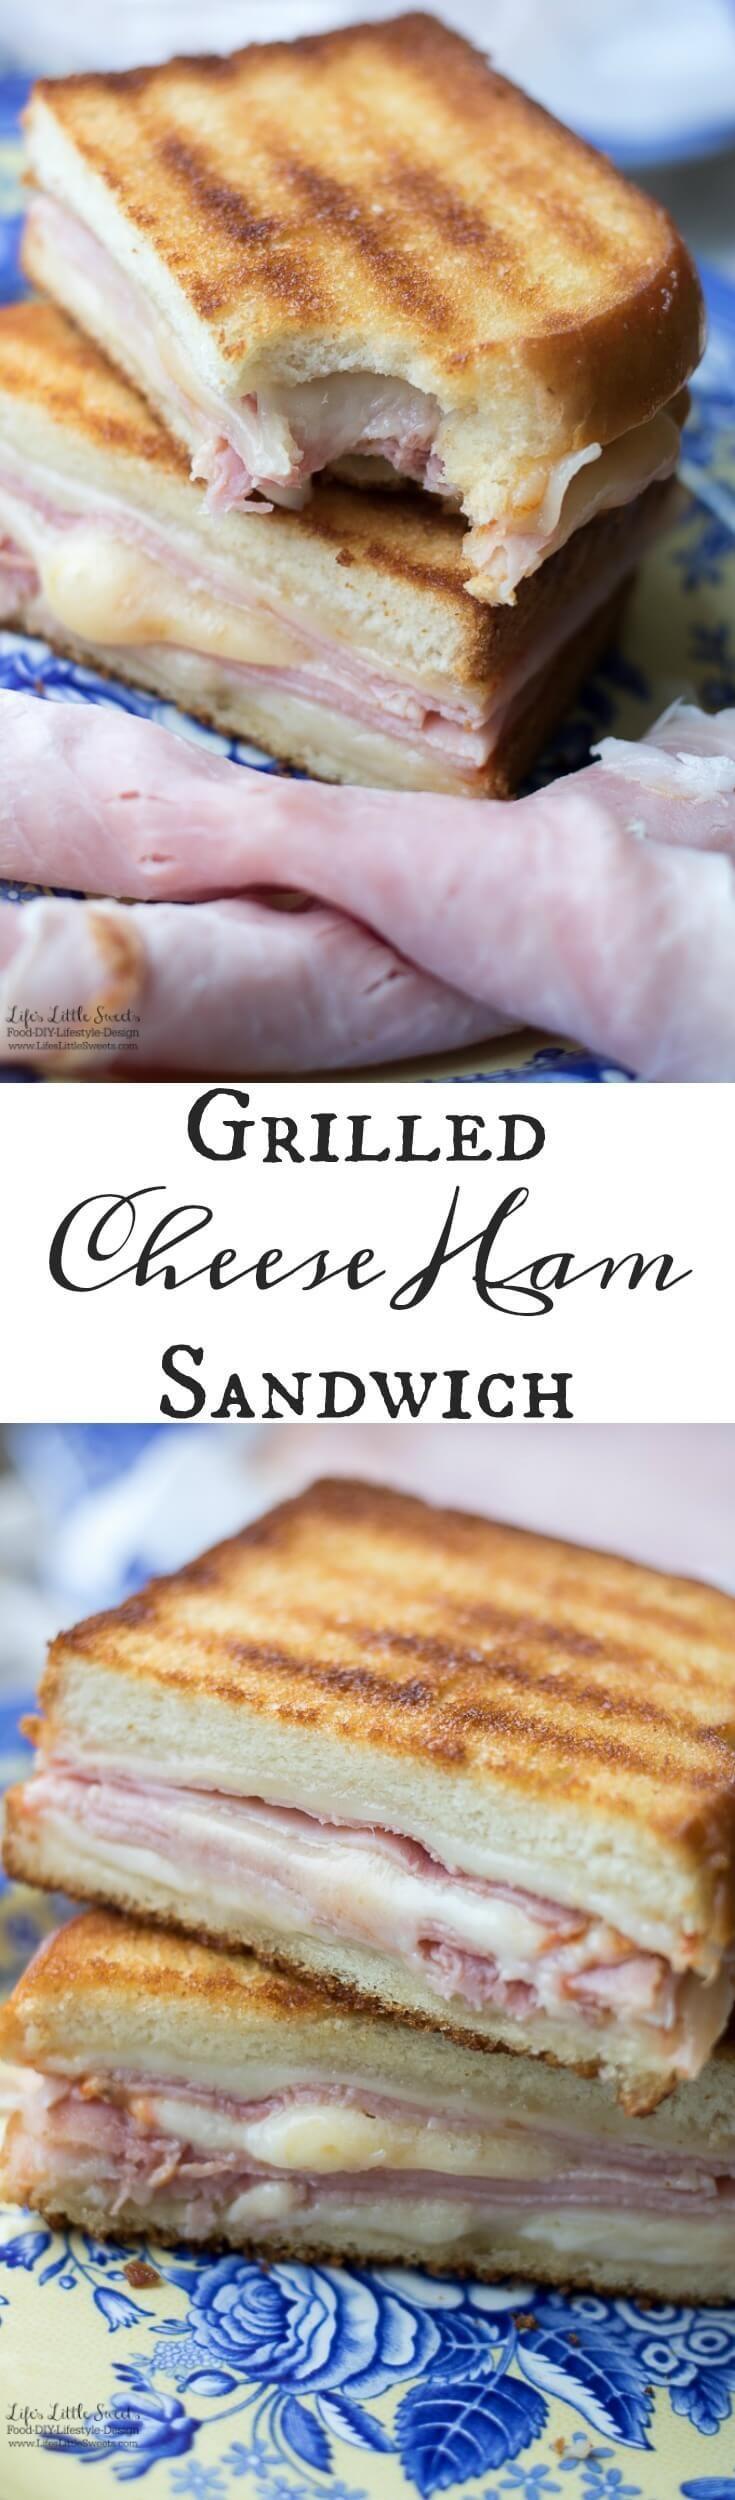 This Grilled Cheese Ham Sandwich has 2 kinds of cheese, Eckrich Virginia Brand Ham and sliced bread. #AskForEckrich #EckrichFlavor #CollectiveBias #ad @SoFabFood @Walmart